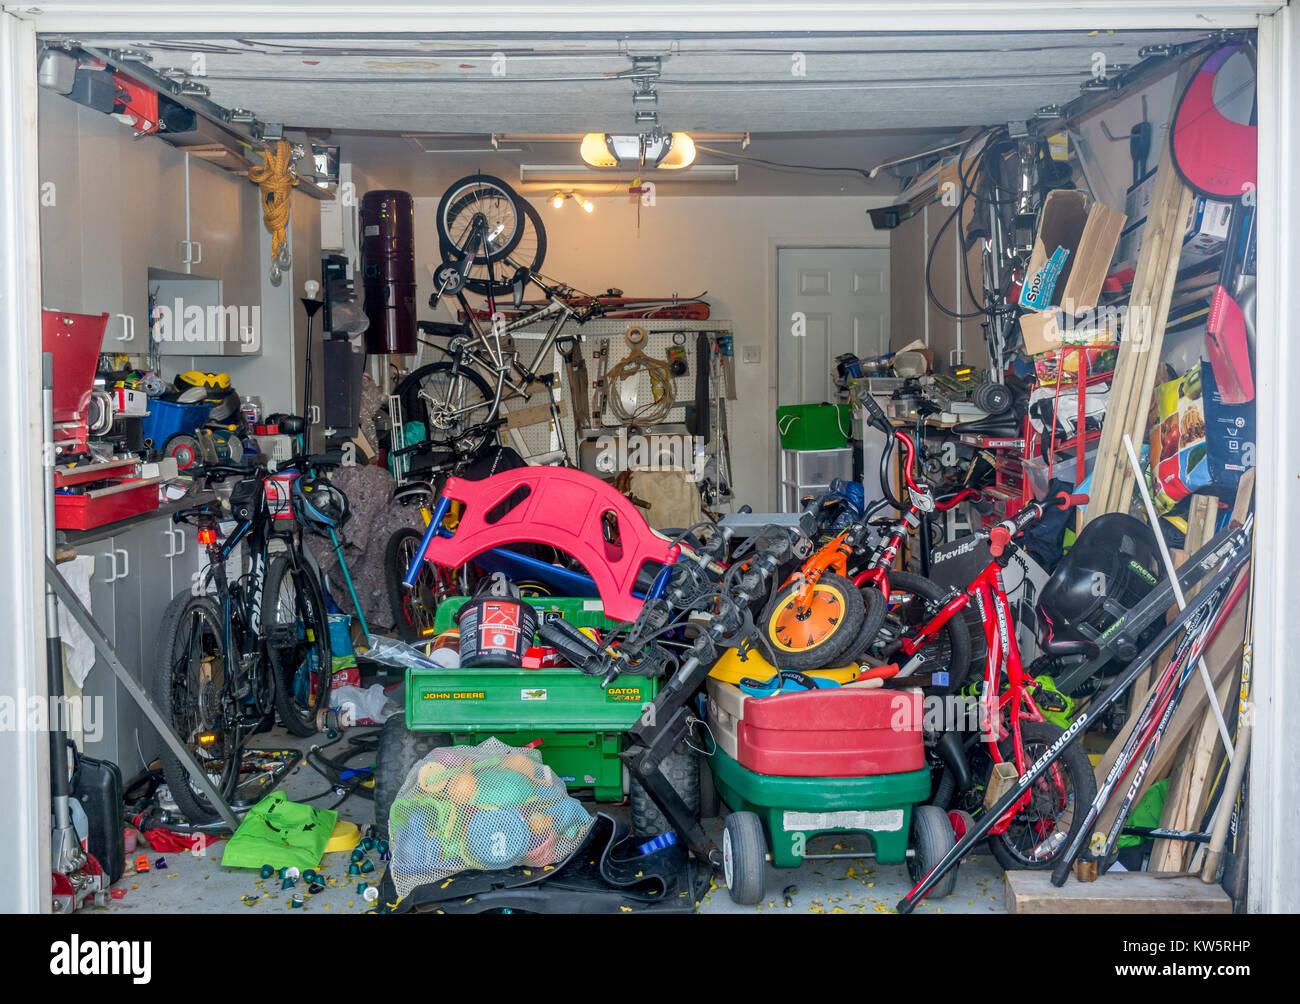 messy garage stock photos messy garage stock images alamy